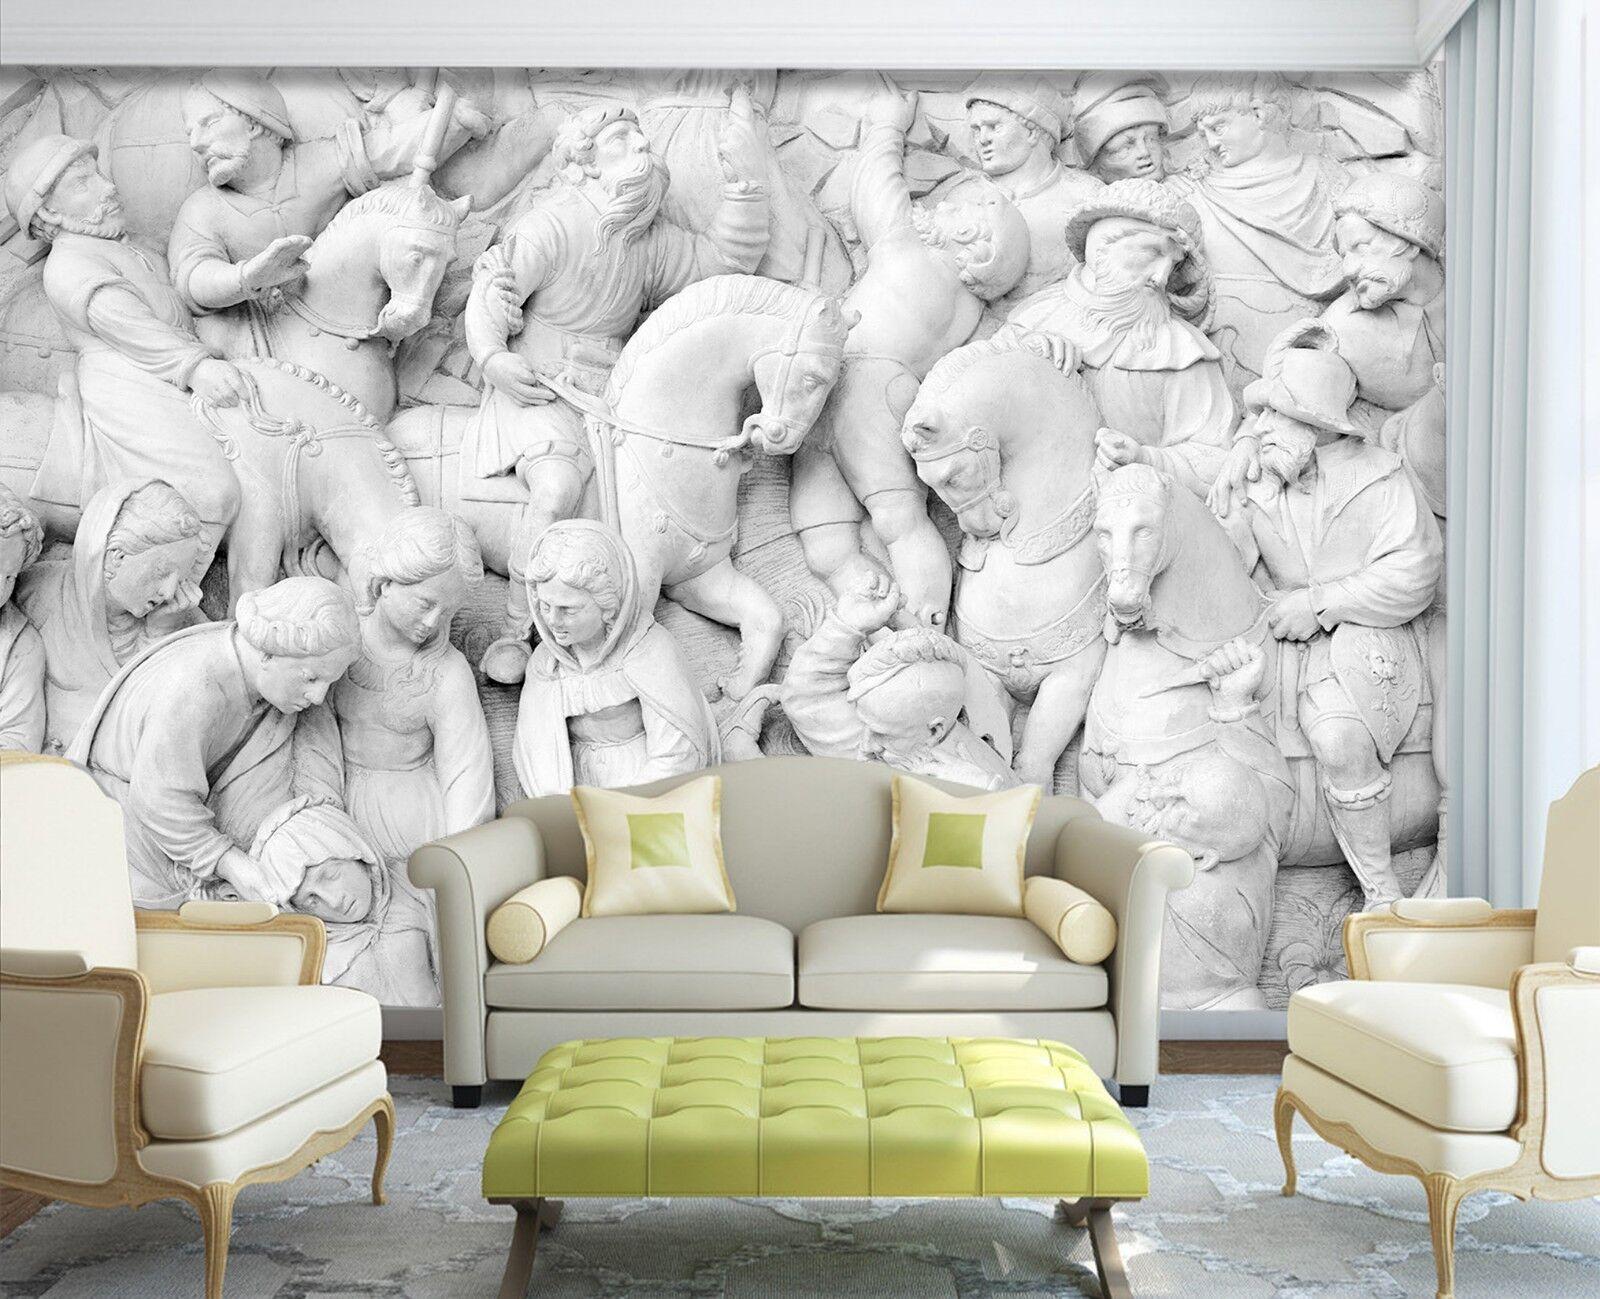 3D Ancient People Sculpture 3 Wallpaper Mural Print Wall Indoor Wallpaper Murals